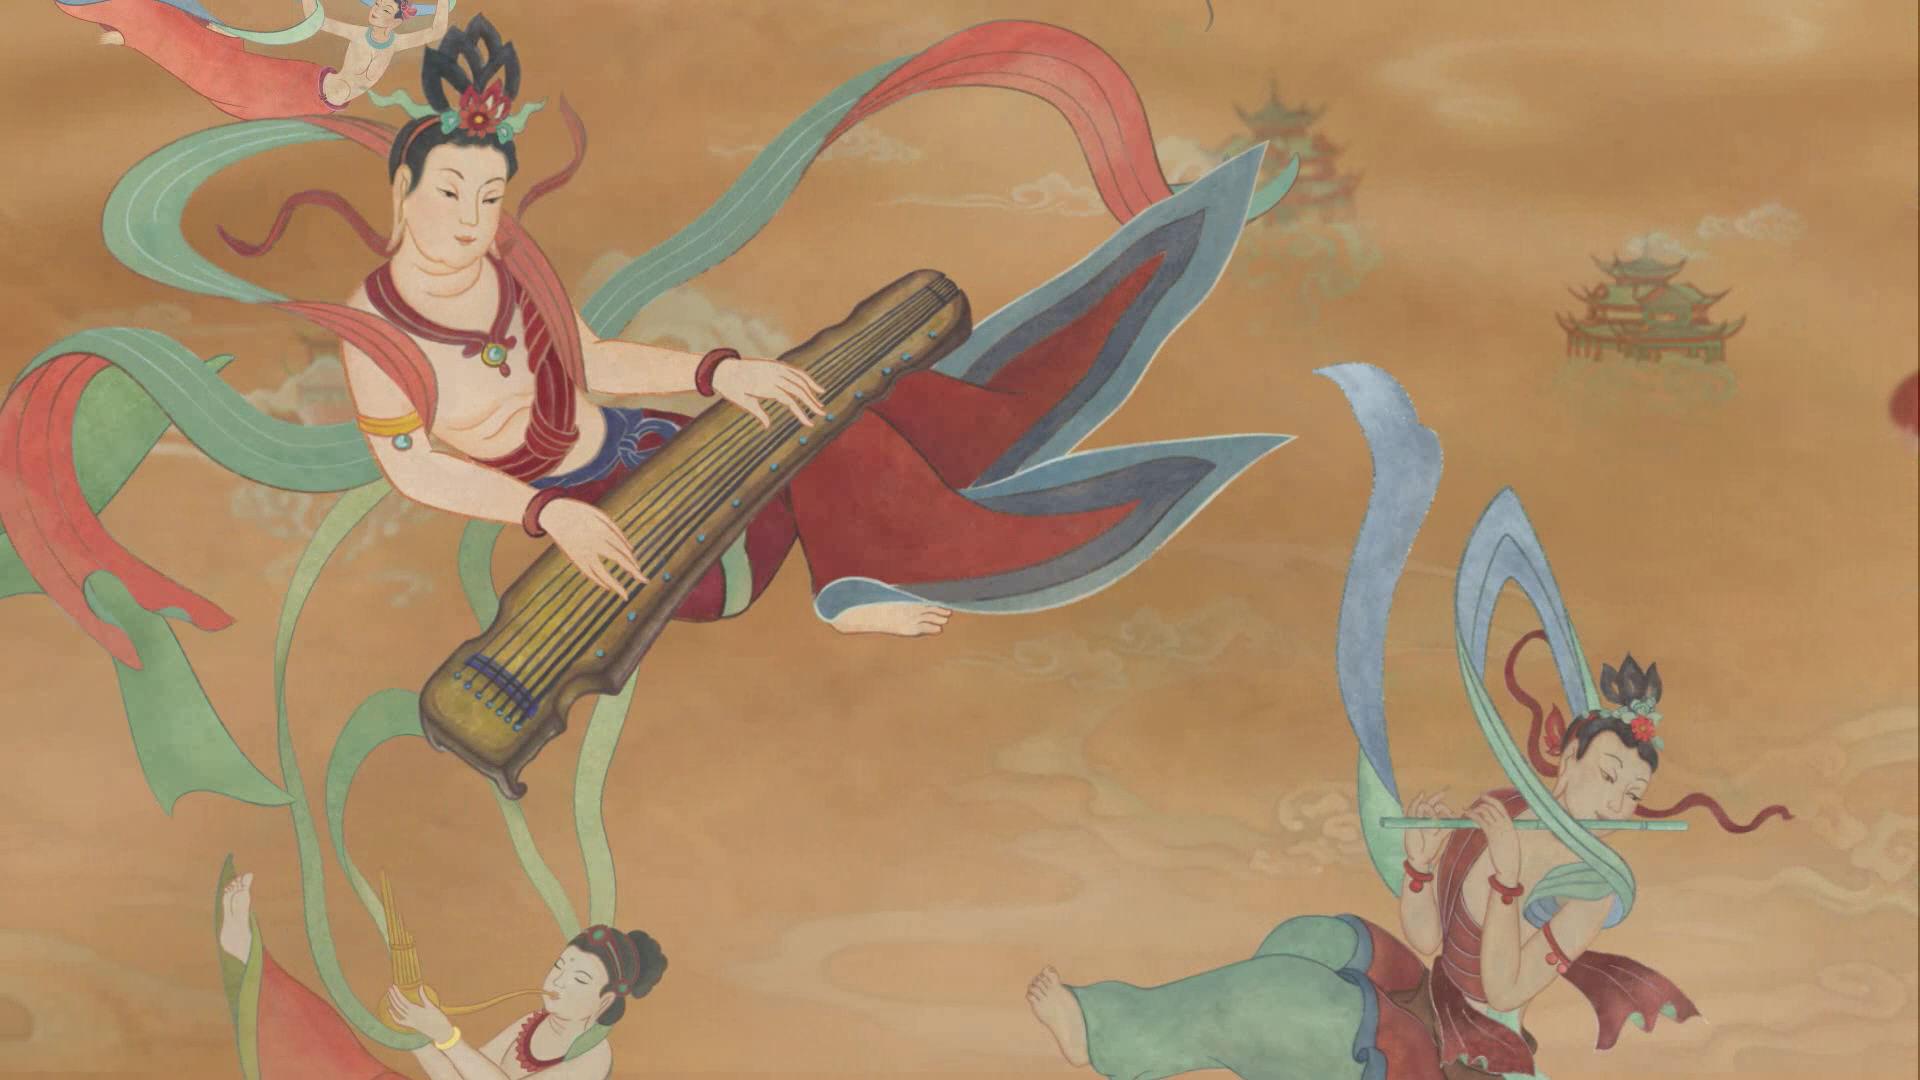 【佳作欣赏】飞天( flying apsaras)图片